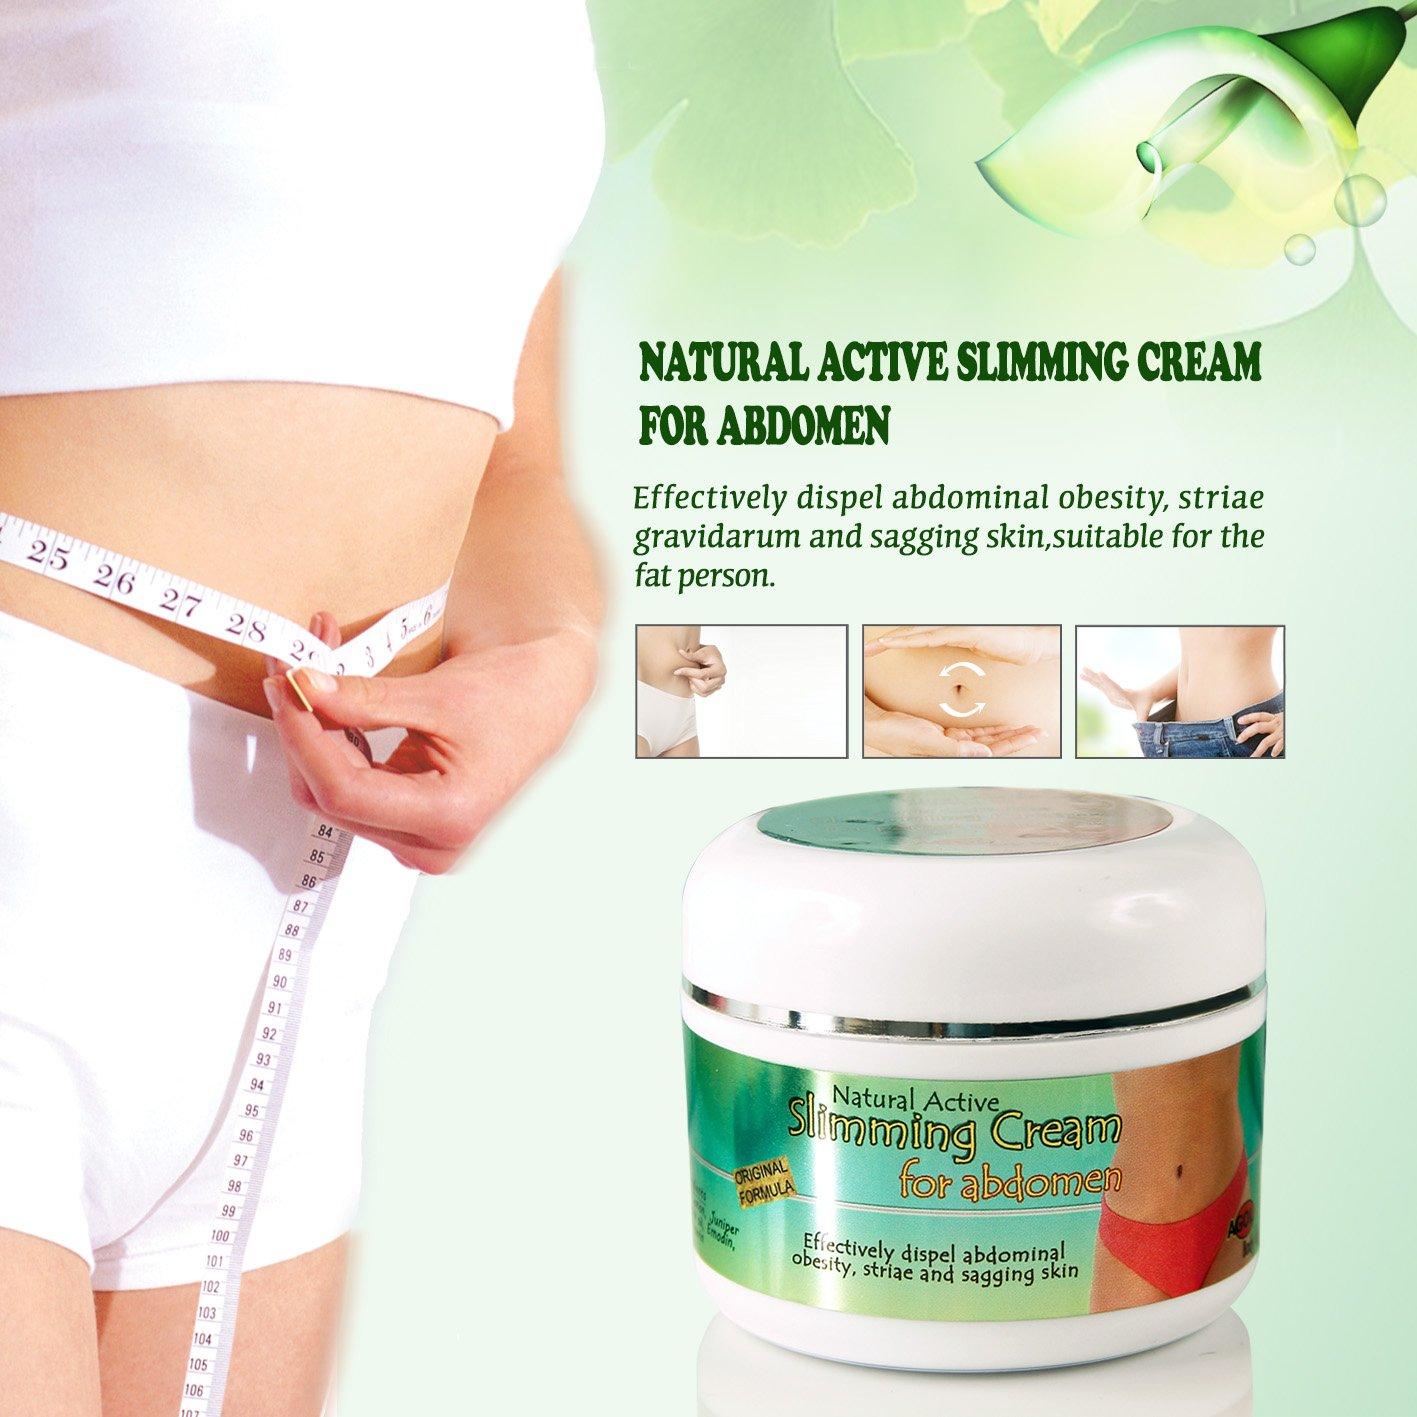 Slimming Cream Anti Cellulite Abdomen Organic Natural Body Slimming Treatment, Skin Tightening Improves Sagging Skin - Slimmer Healthier Lifestyle Treatment, 7 Oz from Agol BodyLab